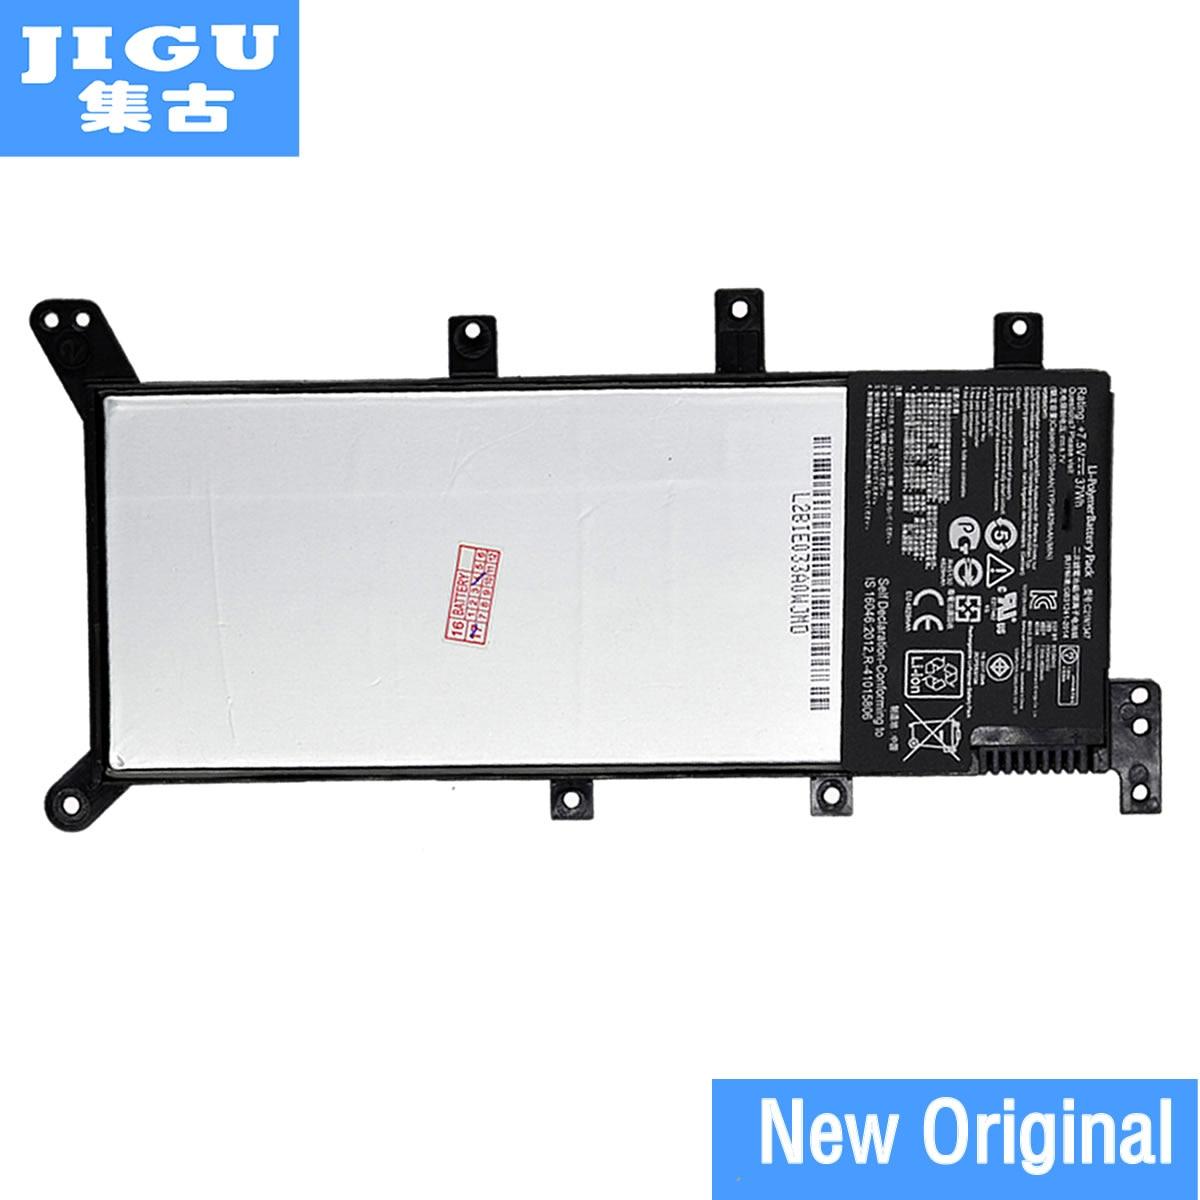 JIGU 2ICP4/63/134 C21N1347 Original laptop Battery For ASUS A555L A555LP5200 F555LN X555LN A555LD4210 A555LD5200 laptop battery for asus x552 x552cl x552e x552ea x552ep x552l x552ld x552vl x552la 15v 2950mah 44wh li ion oem